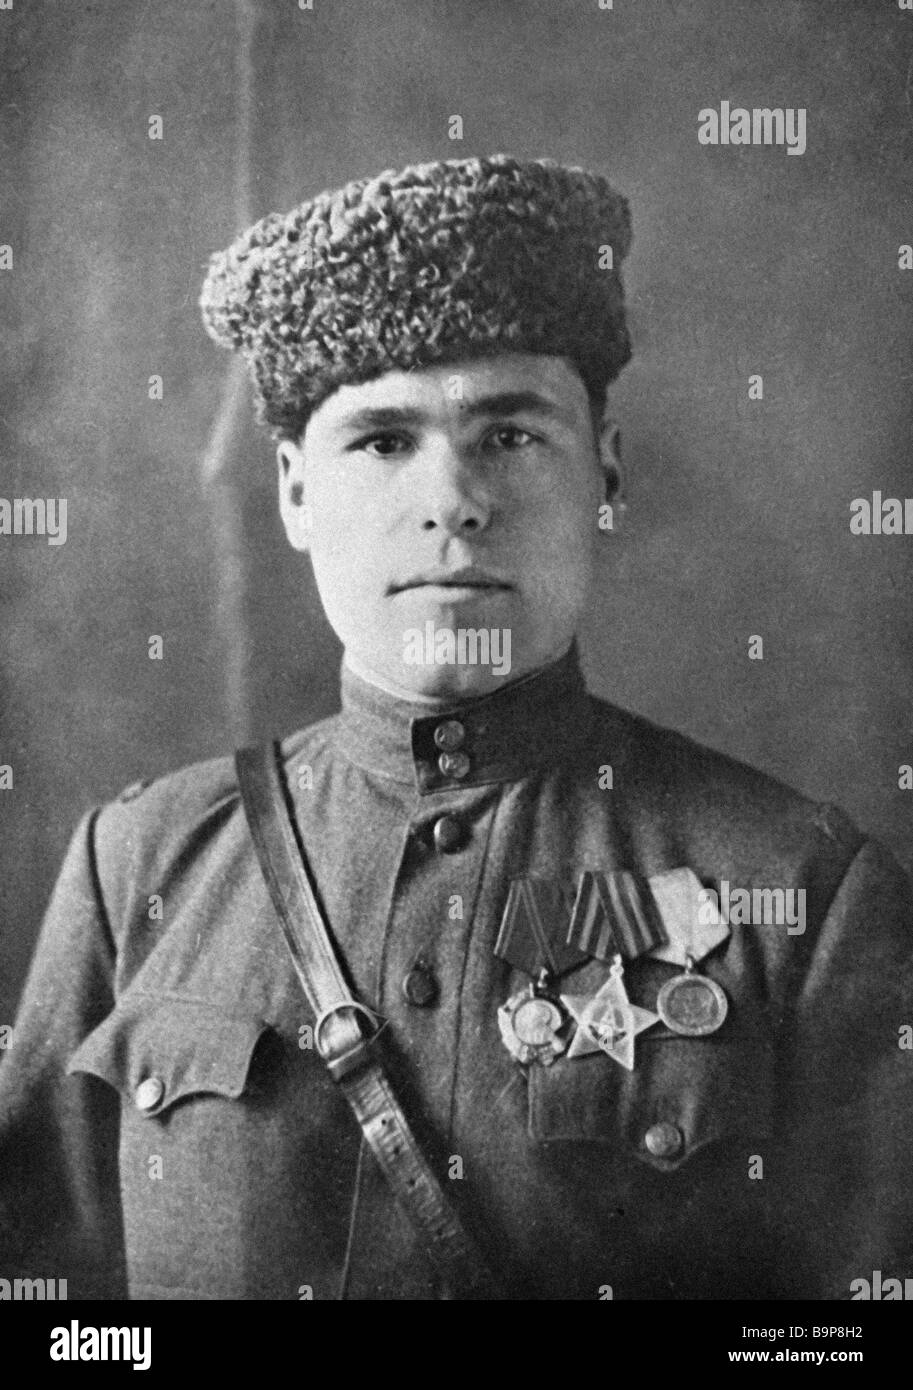 War veteran D Chervyakov - Stock Image